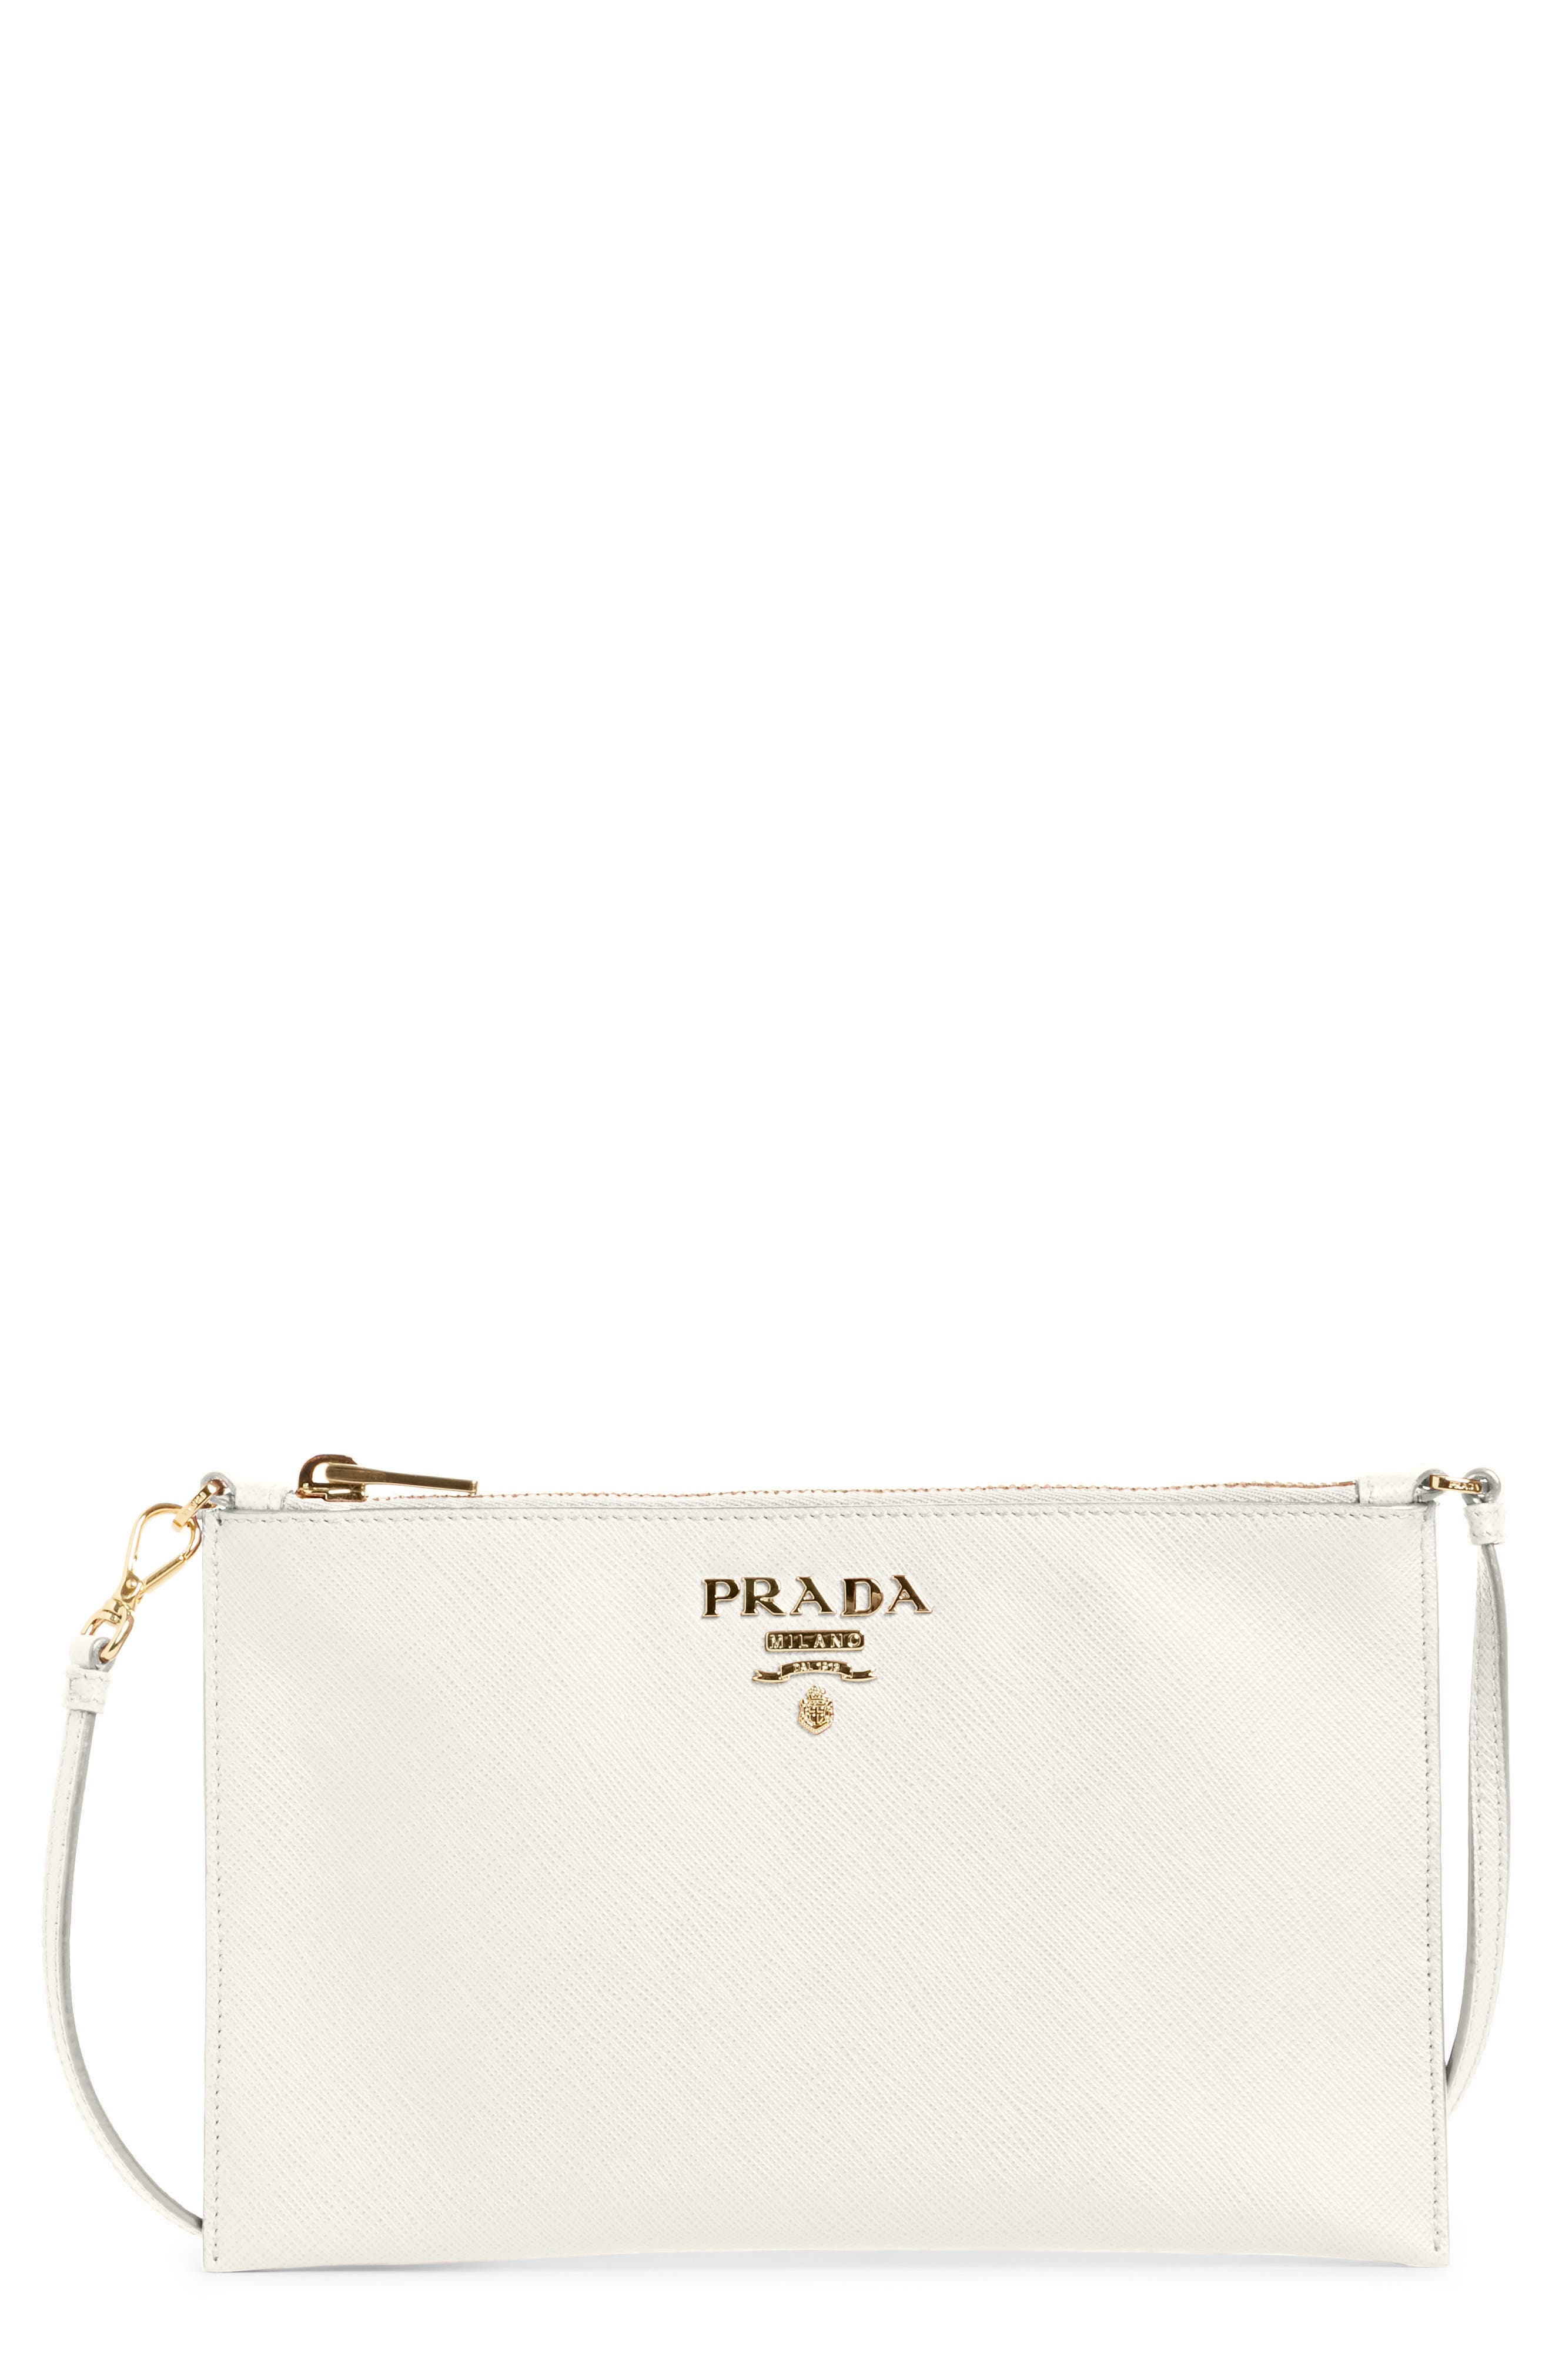 Saffiano Leather Shoulder Bag,                         Main,                         color, F0009 Bianco